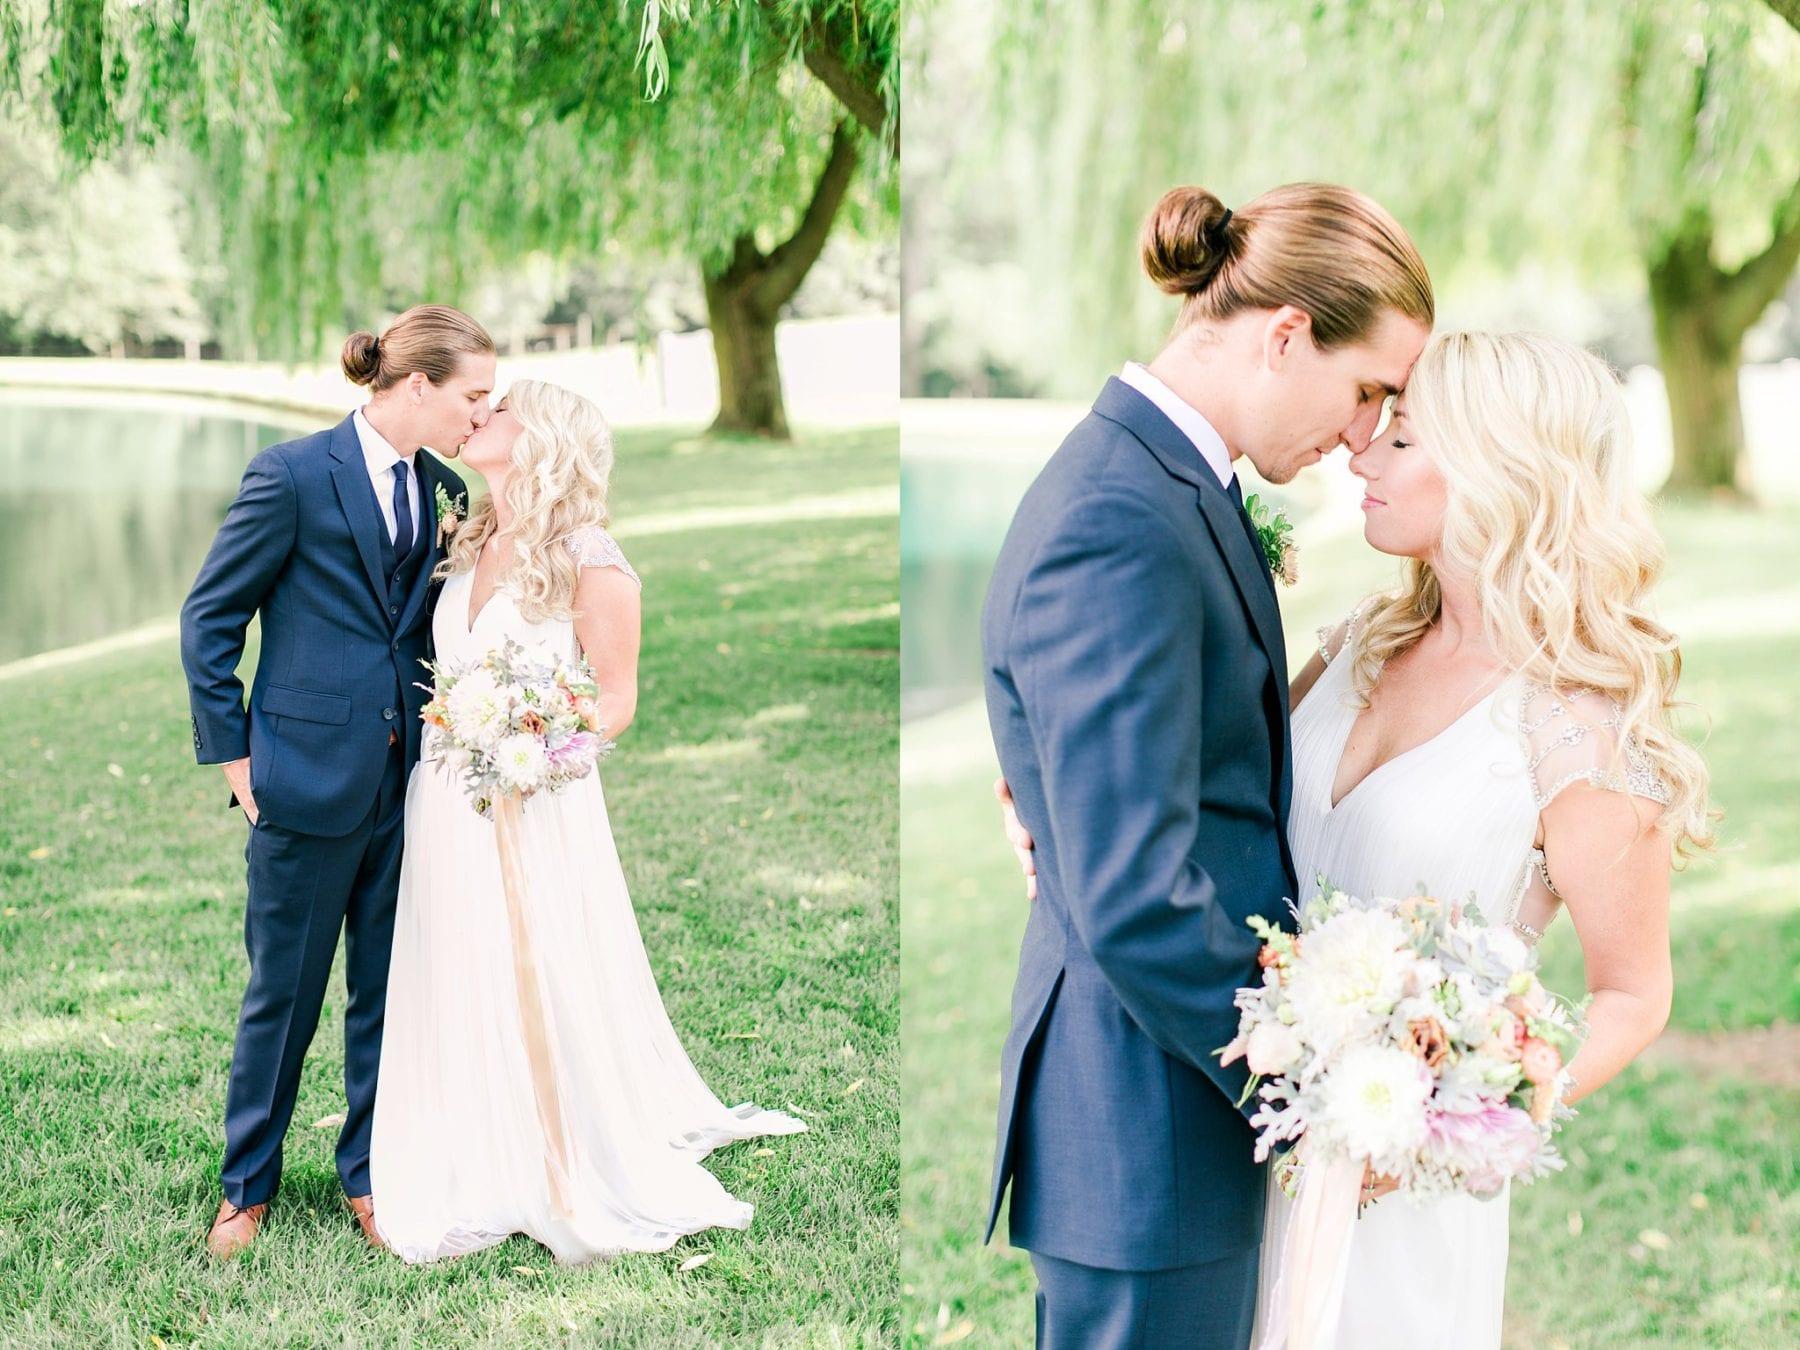 Pond View Farm Wedding Photos Maryland Wedding Photographer Kristen & Ryan Megan Kelsey Photography Blog-102.jpg